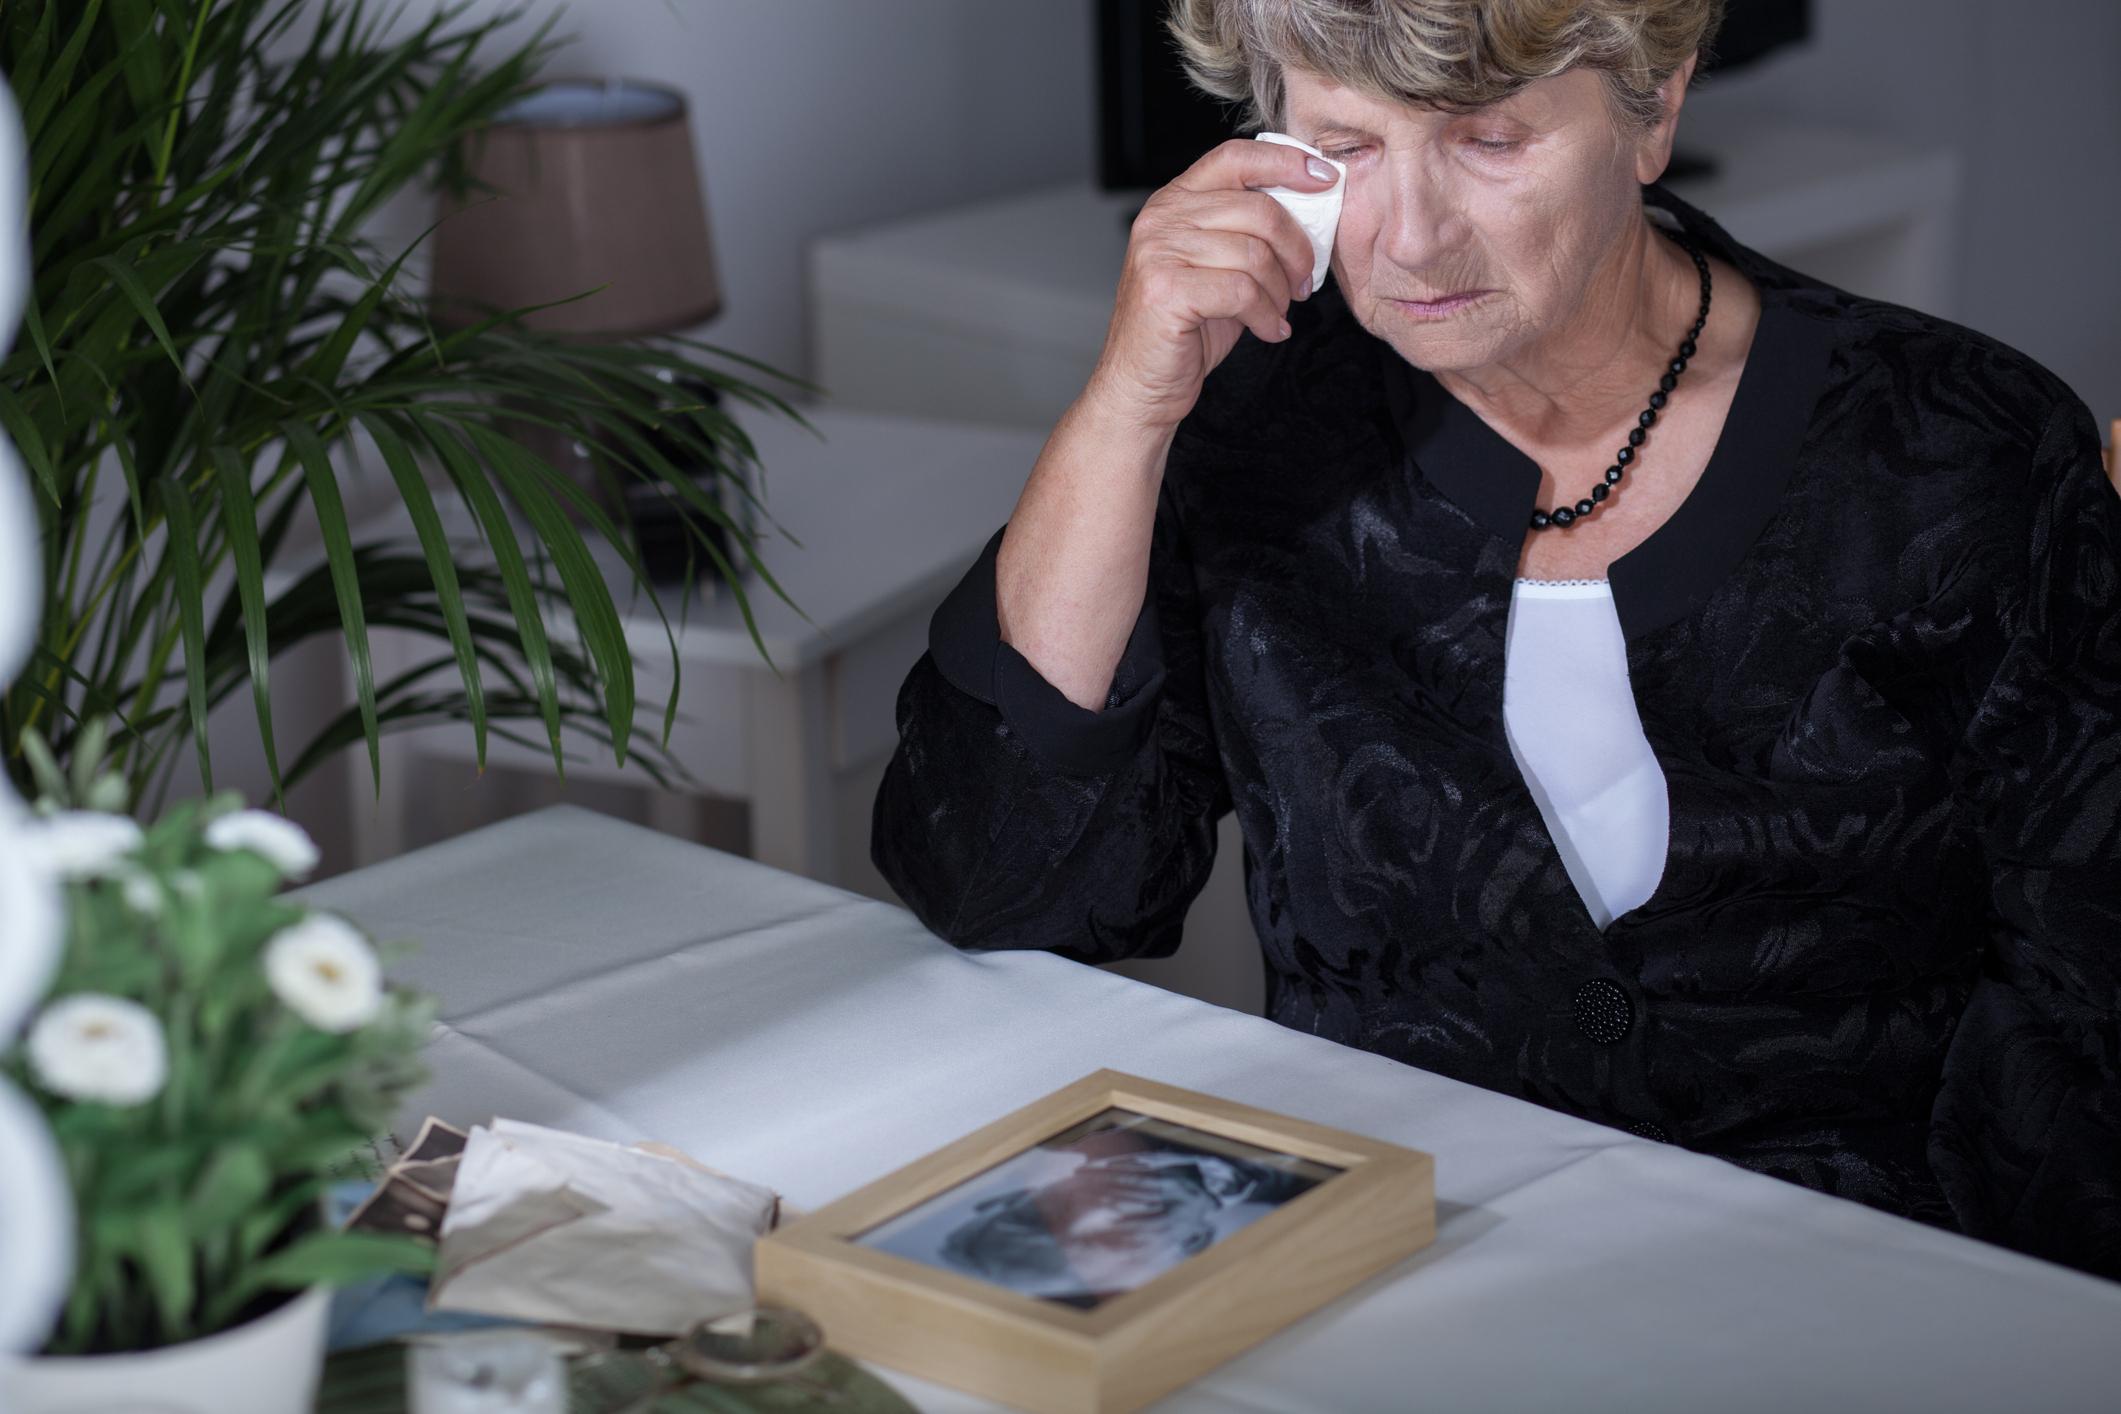 Família vela idosa viva3 min read